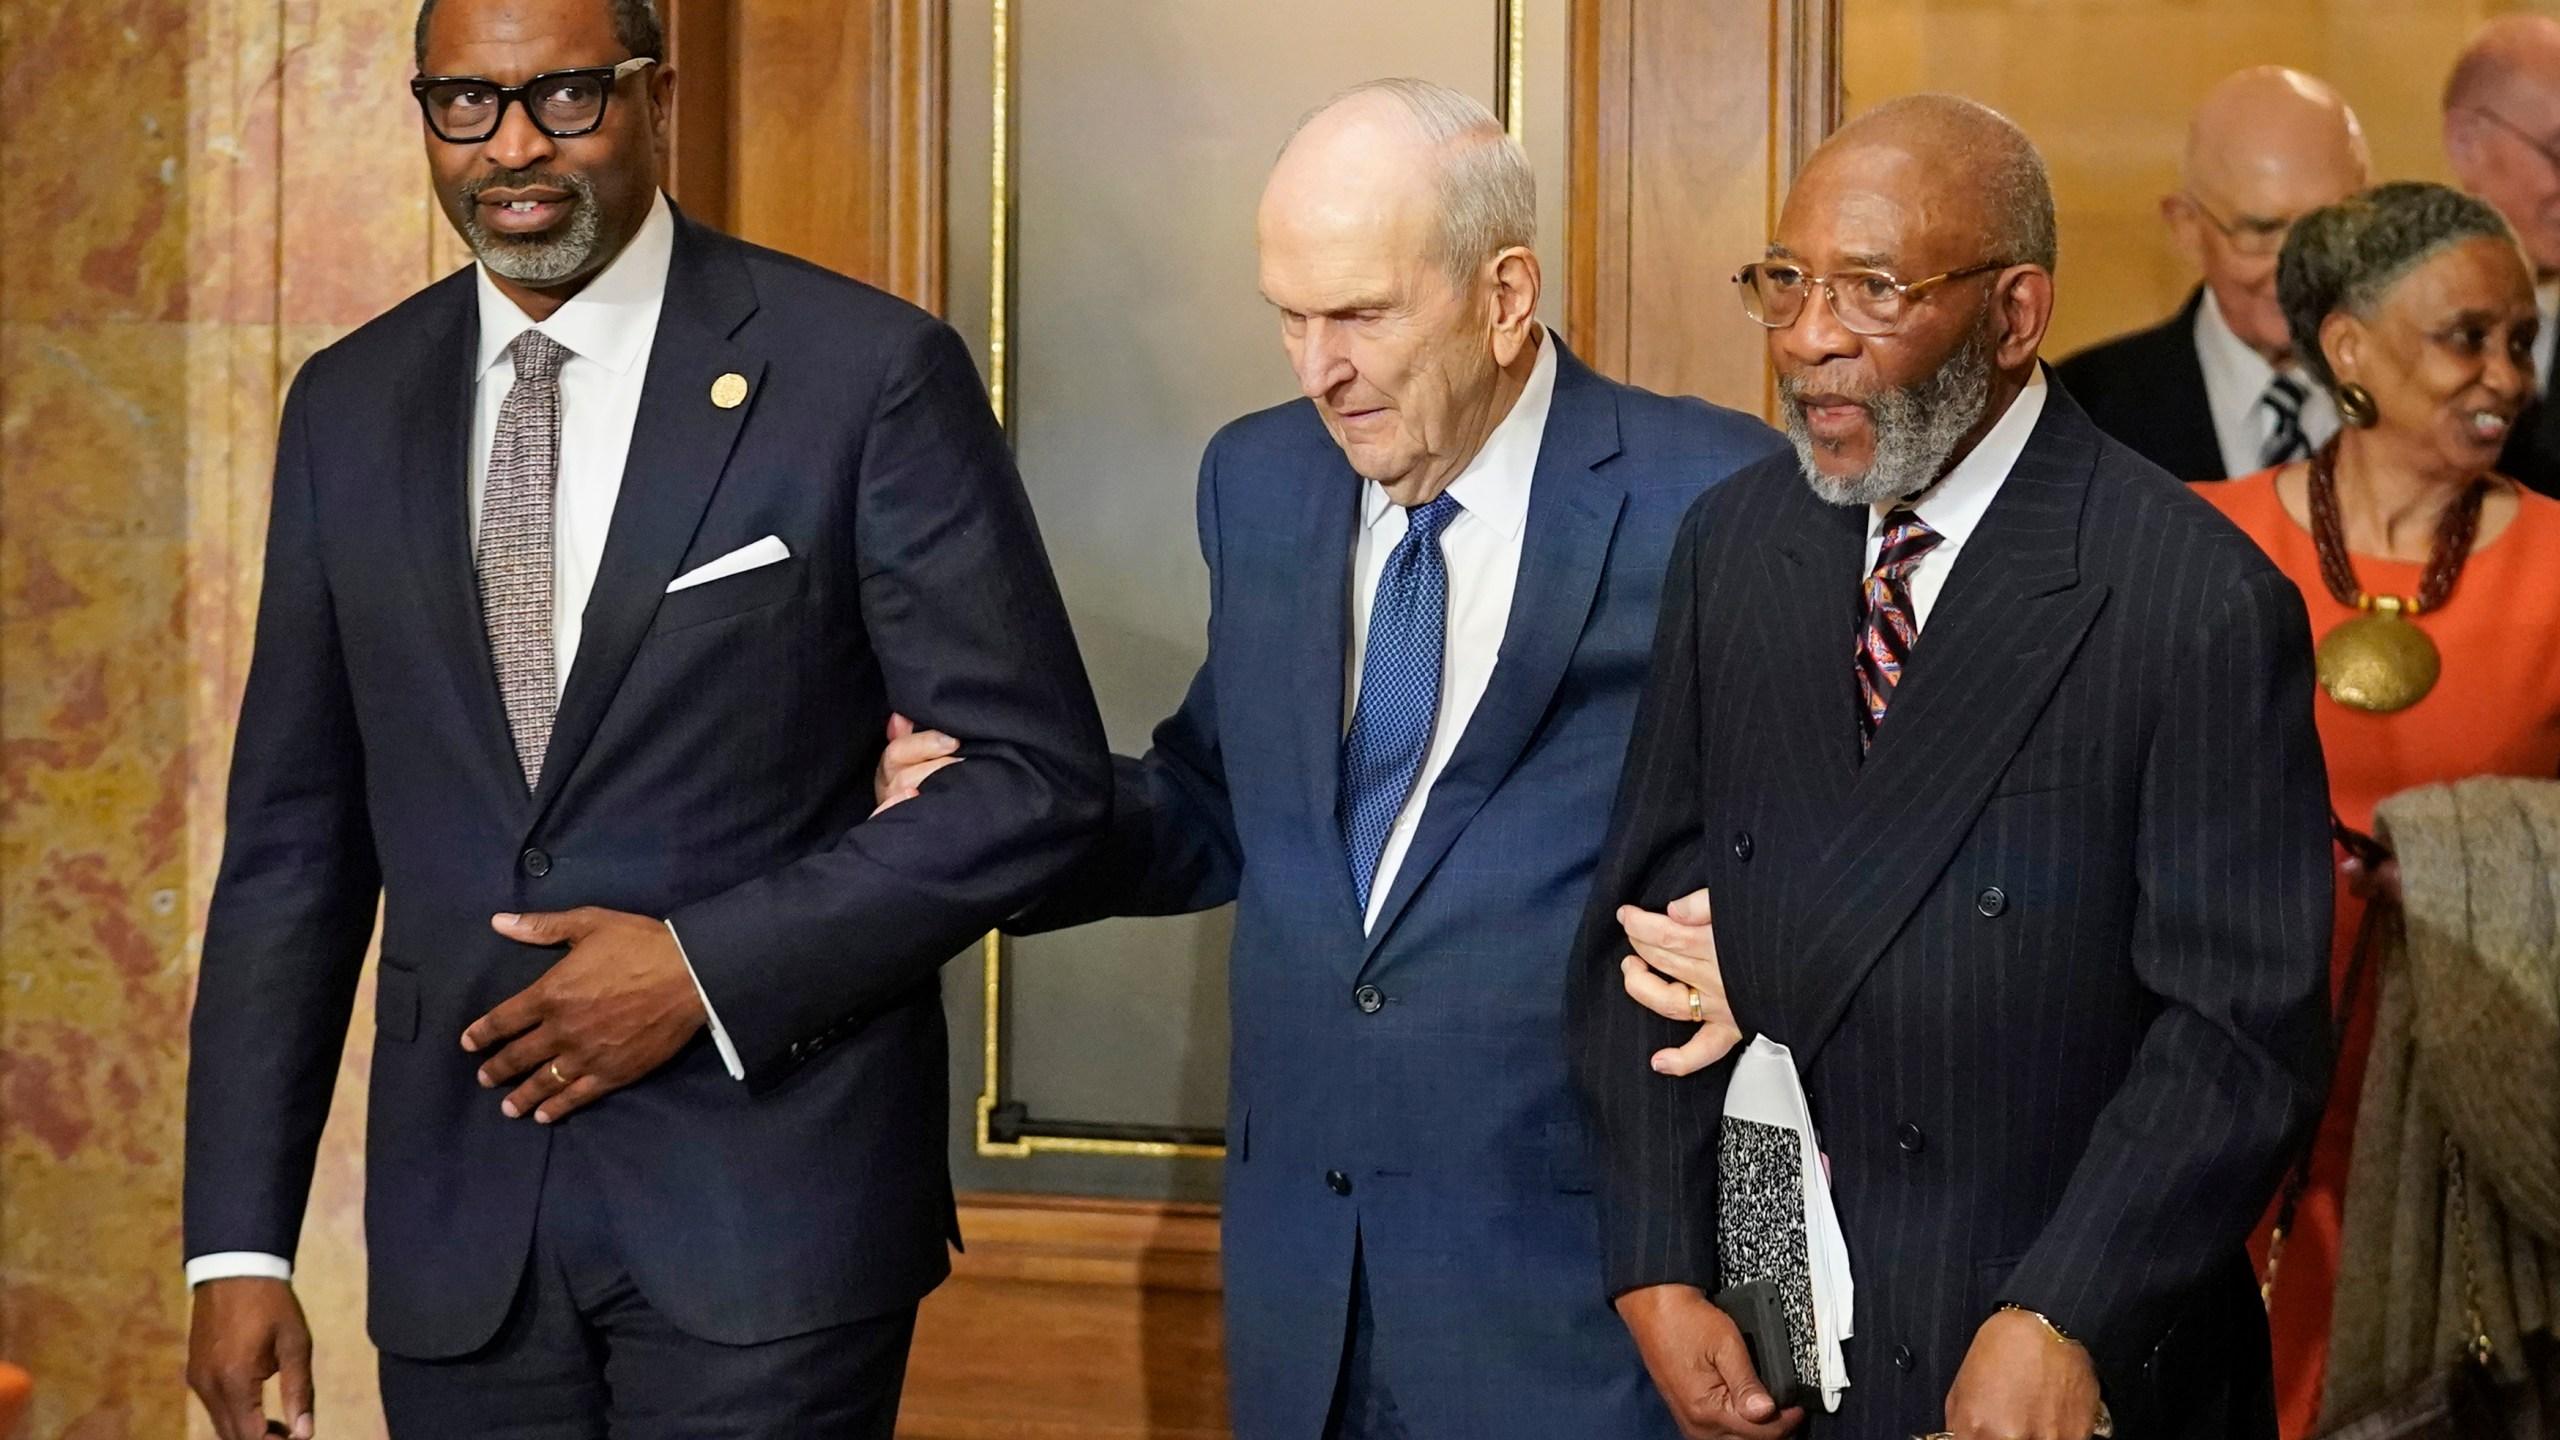 Amos C. Brown, Russell M. Nelson, Derrick Johnson